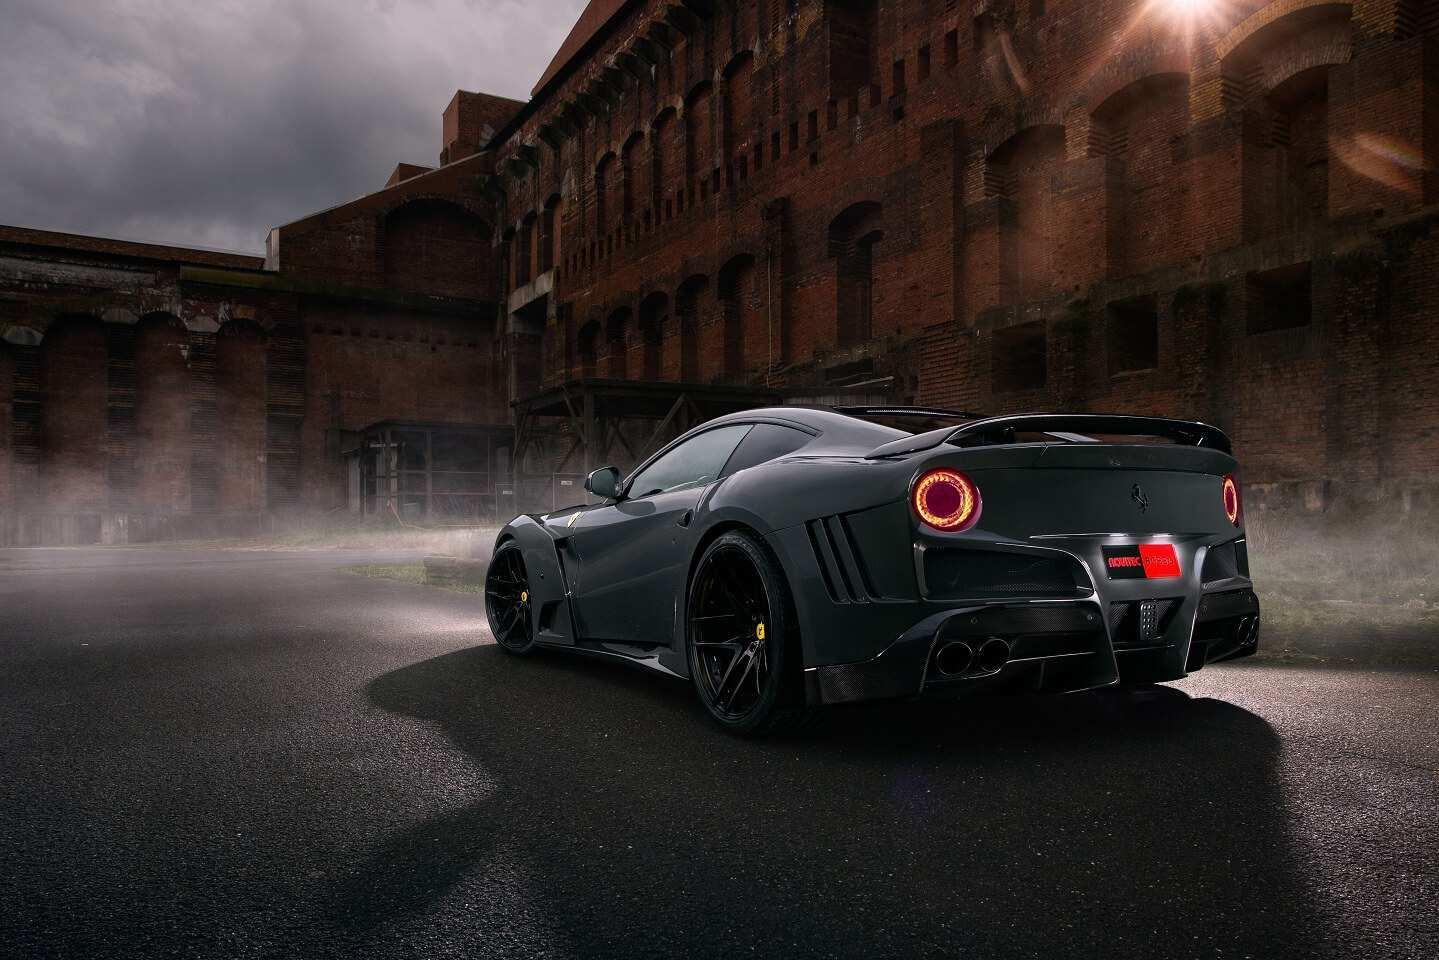 48 All New Ferrari F12 2020 Redesign with Ferrari F12 2020